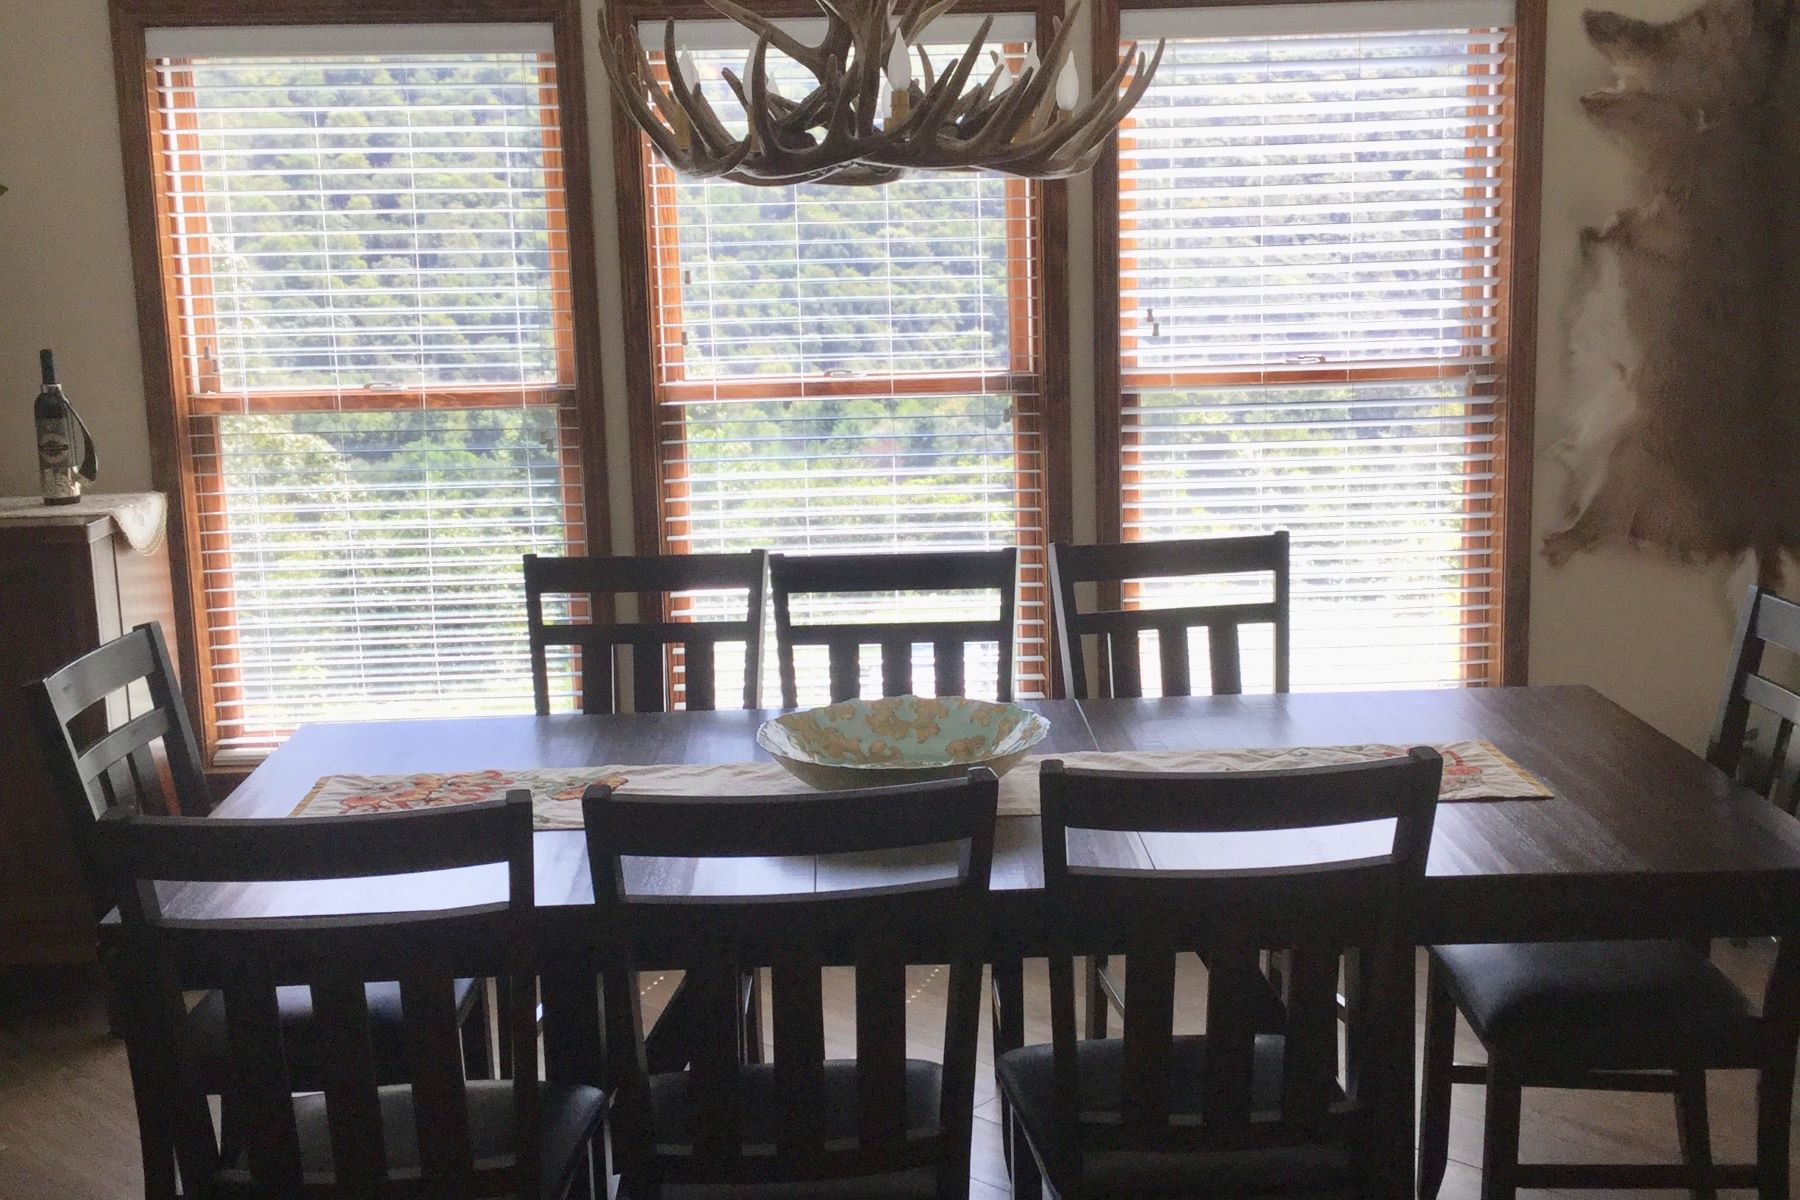 Single Family Homes für Verkauf beim Catskill Mountain Anglers Retreat 2141 Readburn Road, Hancock, New York 13783 Vereinigte Staaten